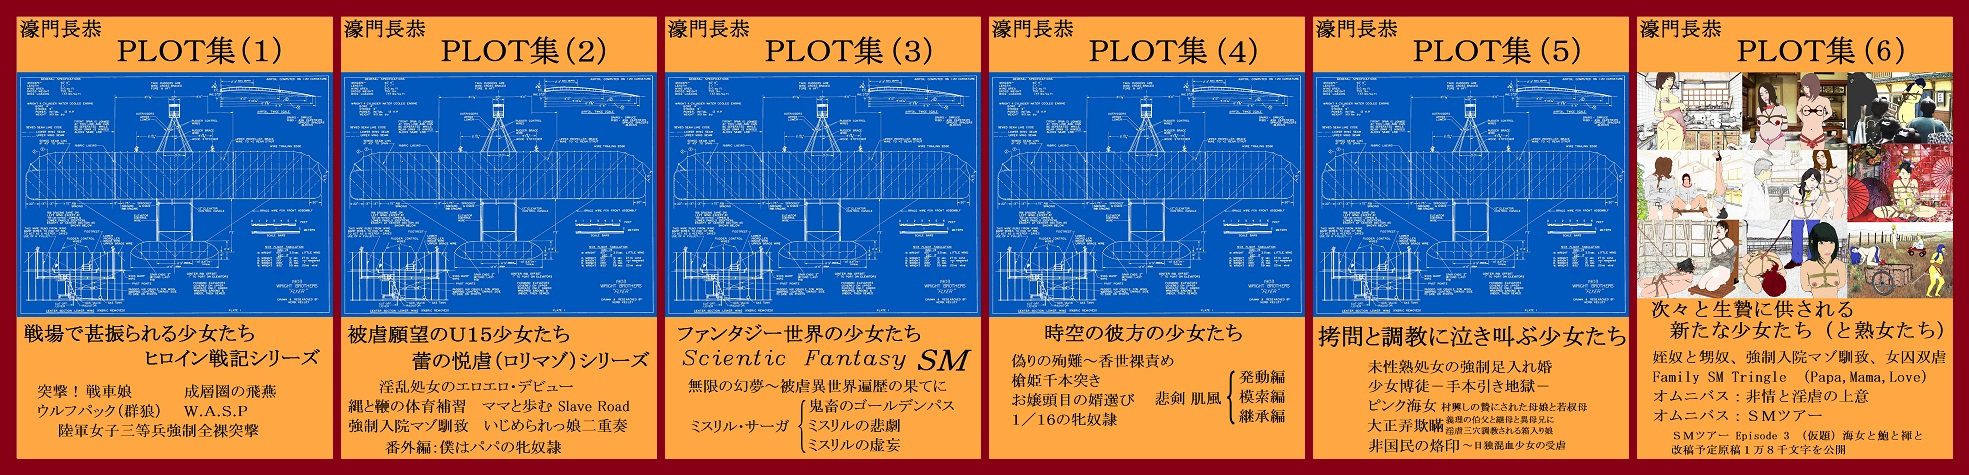 本棚81/PLOT集